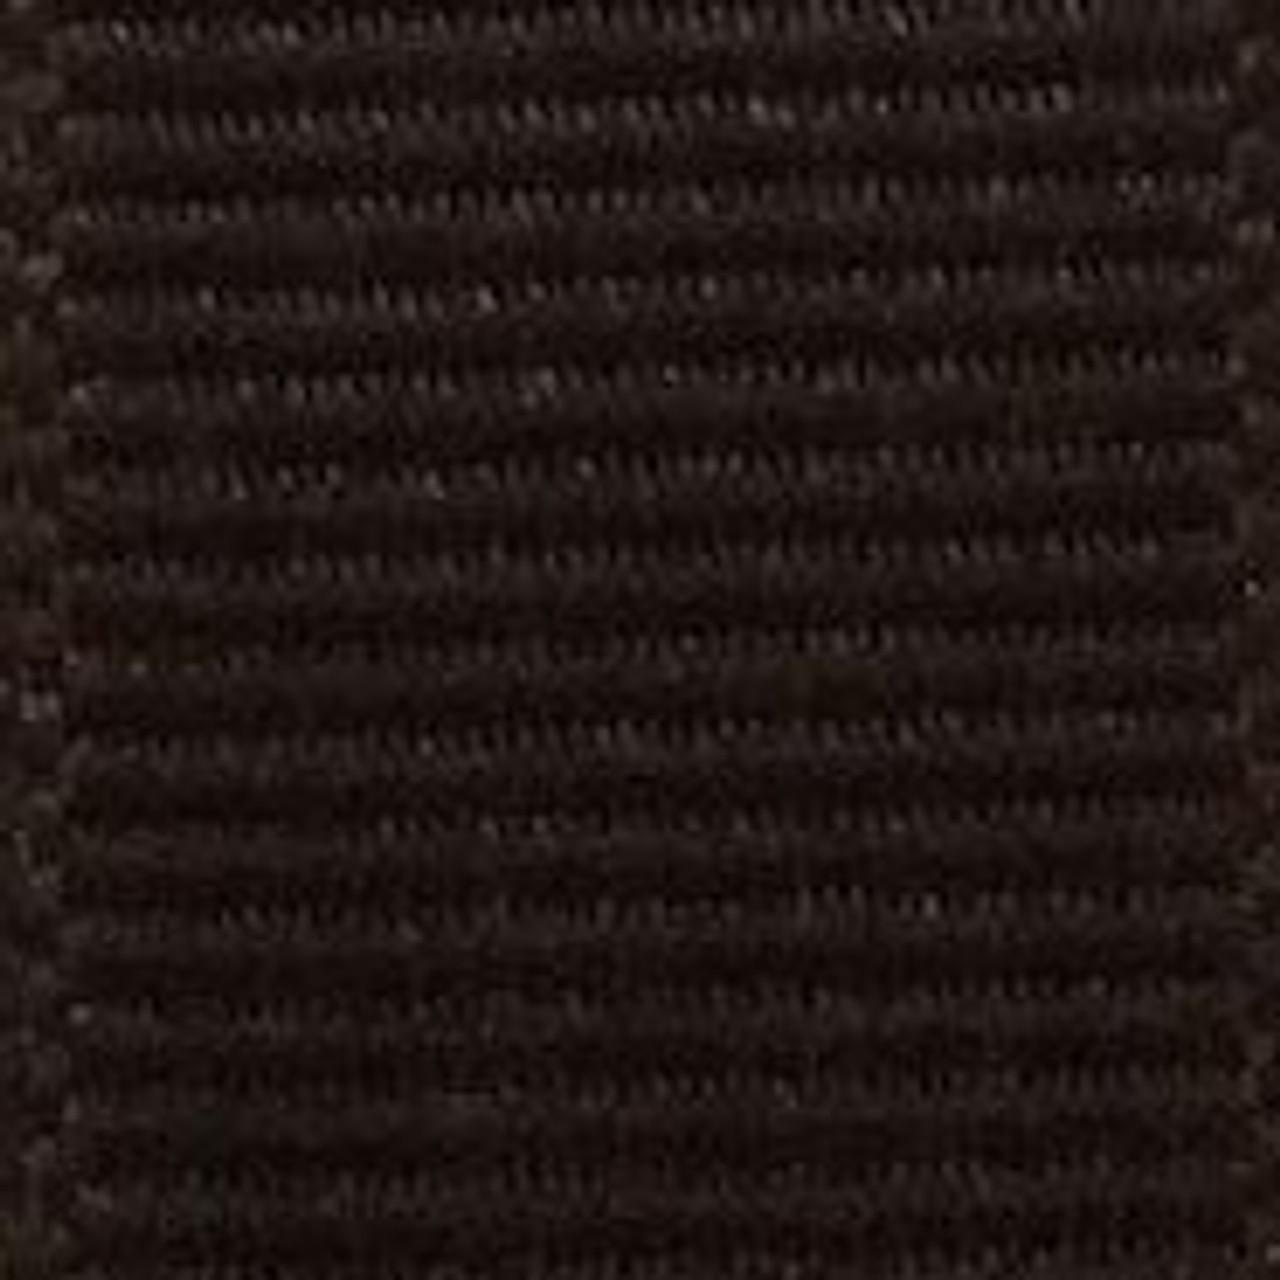 Brown Solid Grosgrain Ribbon